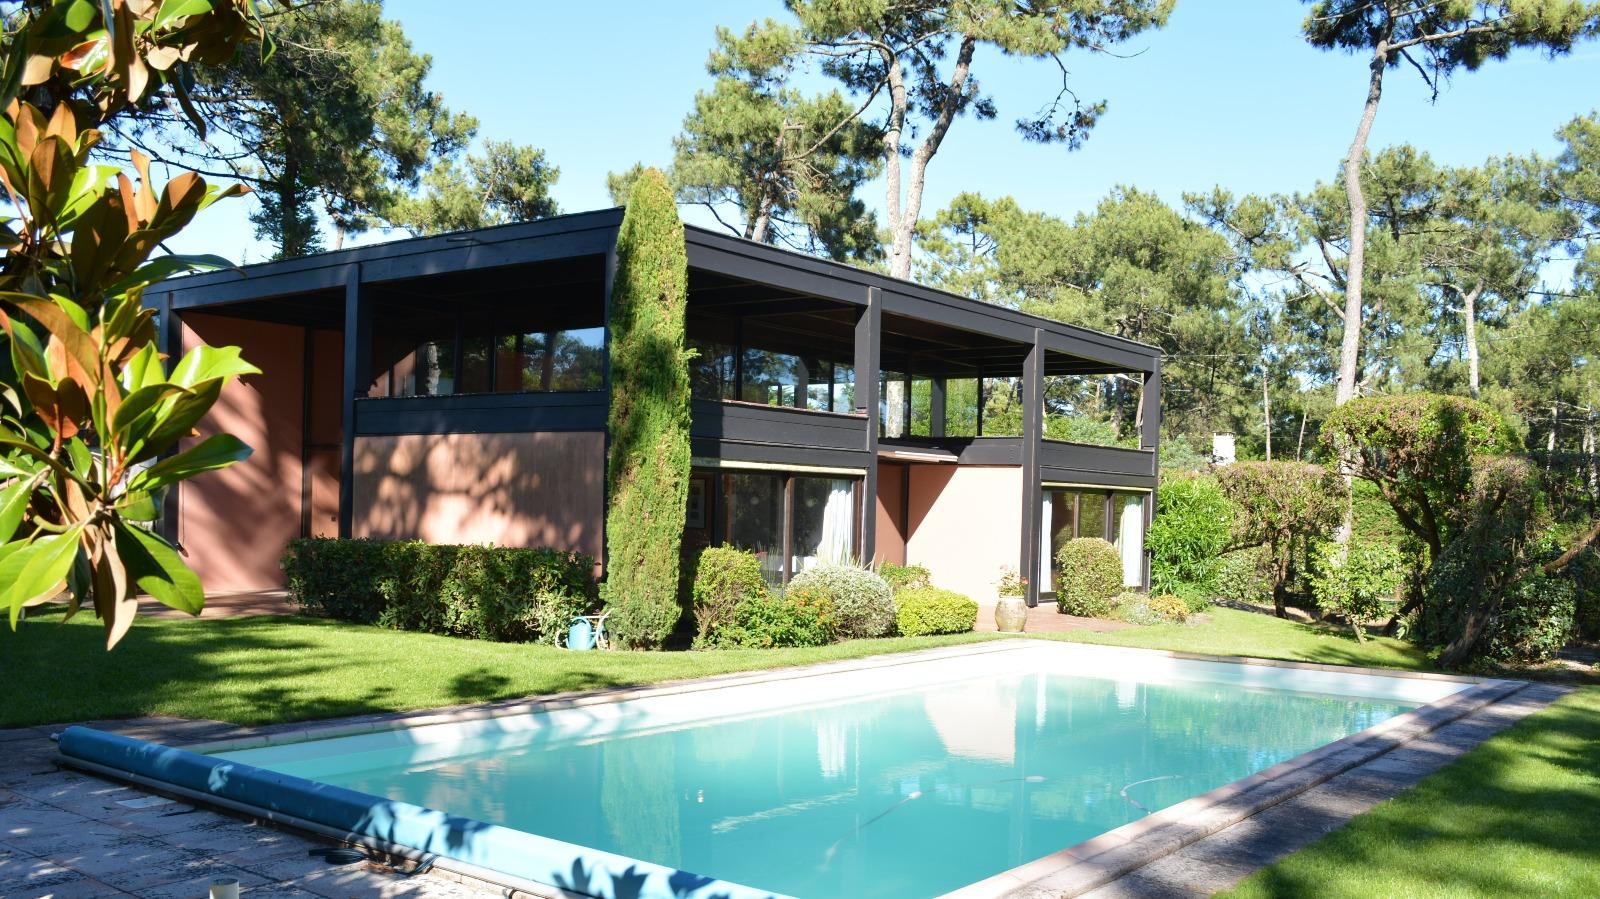 Cap Ferret Maison Avec Piscine Proche Bassin Immo Prestige